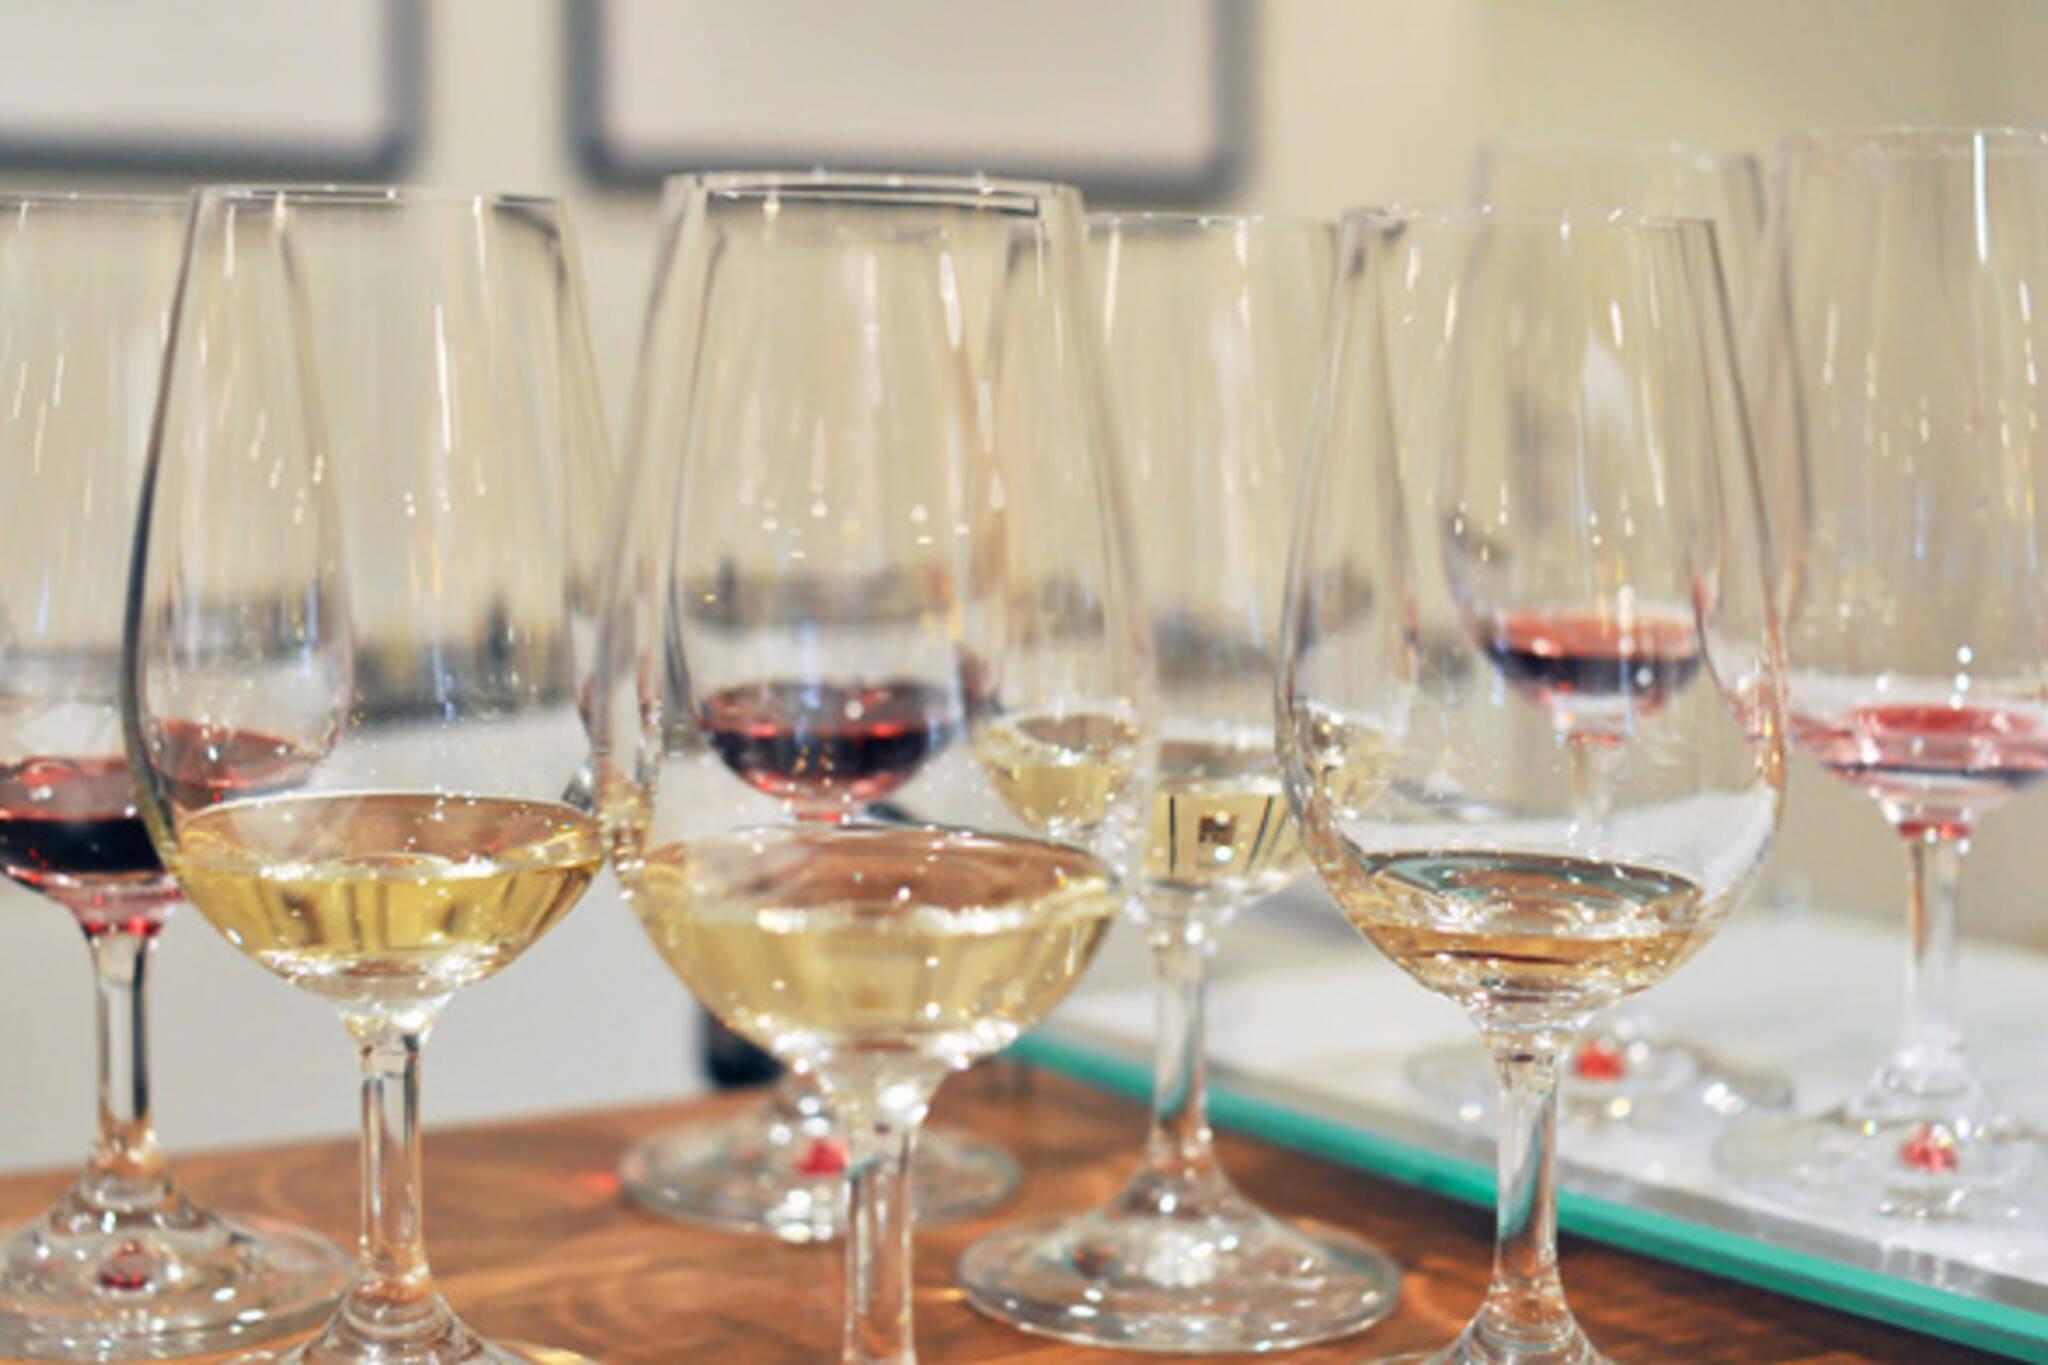 Ontario wineries